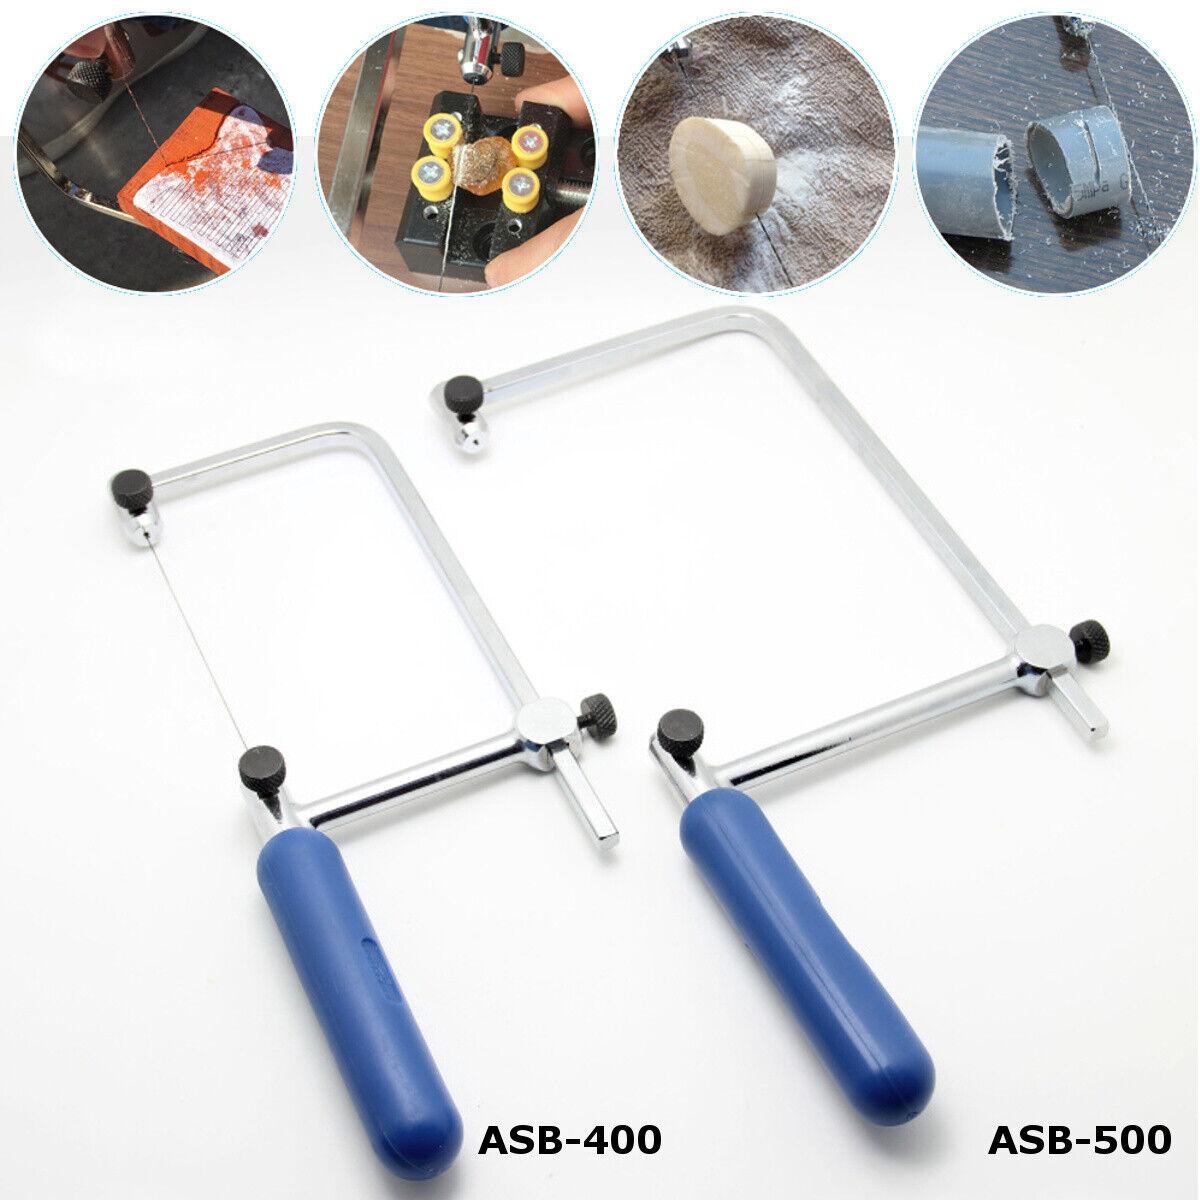 1 X Jade Metal Wire Saw Blade Coping Saw Diamond Wire Saw Frame Cutting Tool